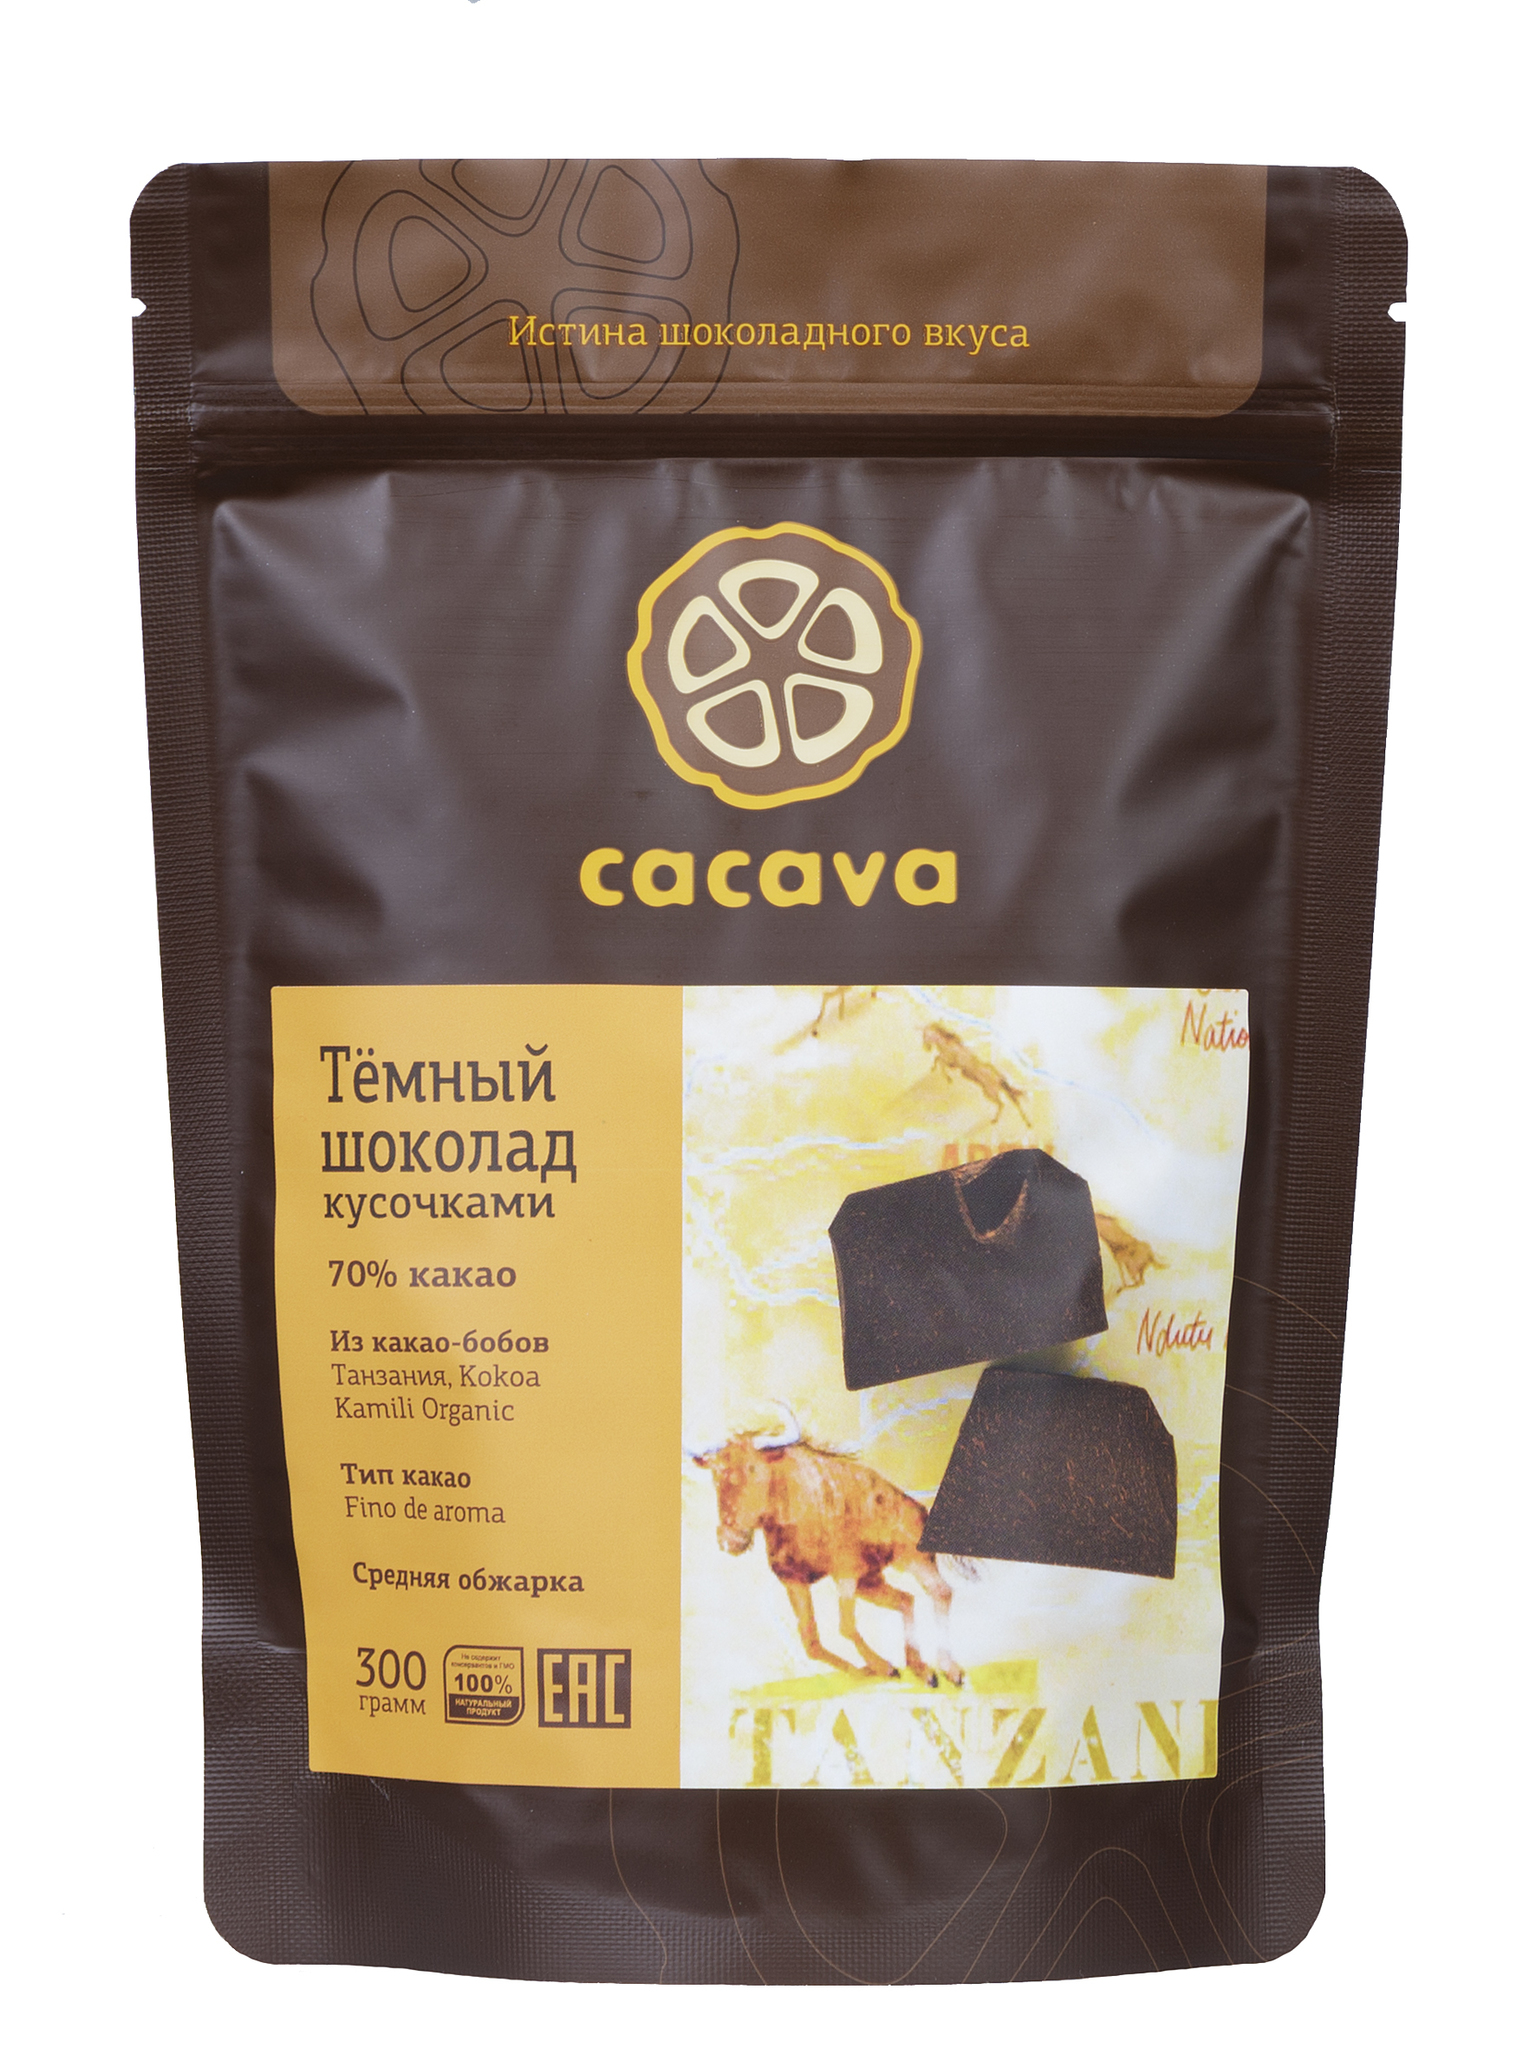 Тёмный шоколад 70 % какао (Танзания, Kokoa Kamili), упаковка 300 грамм